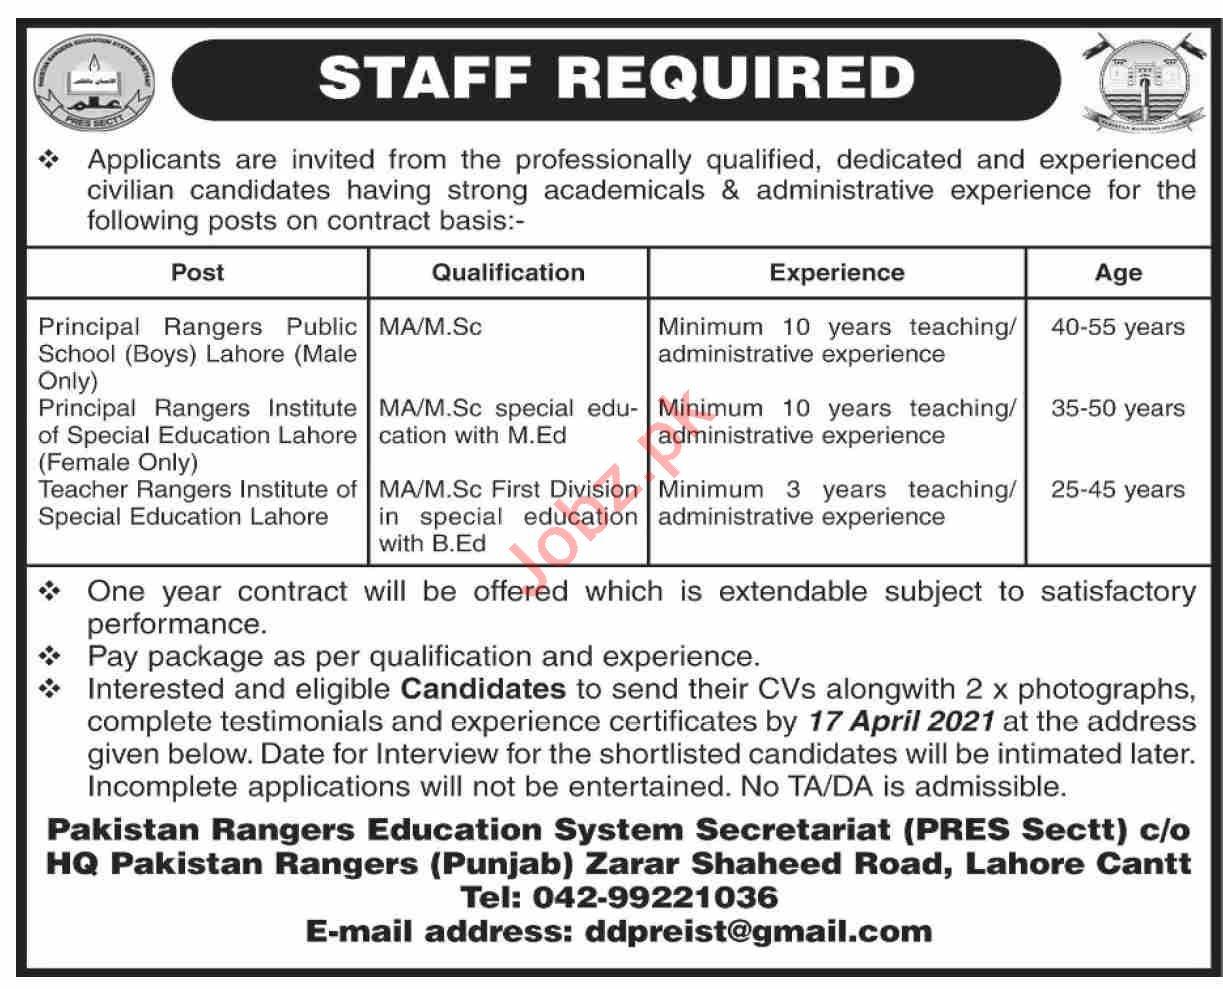 Pakistan Rangers Education System Secretariat PRES Jobs 2021